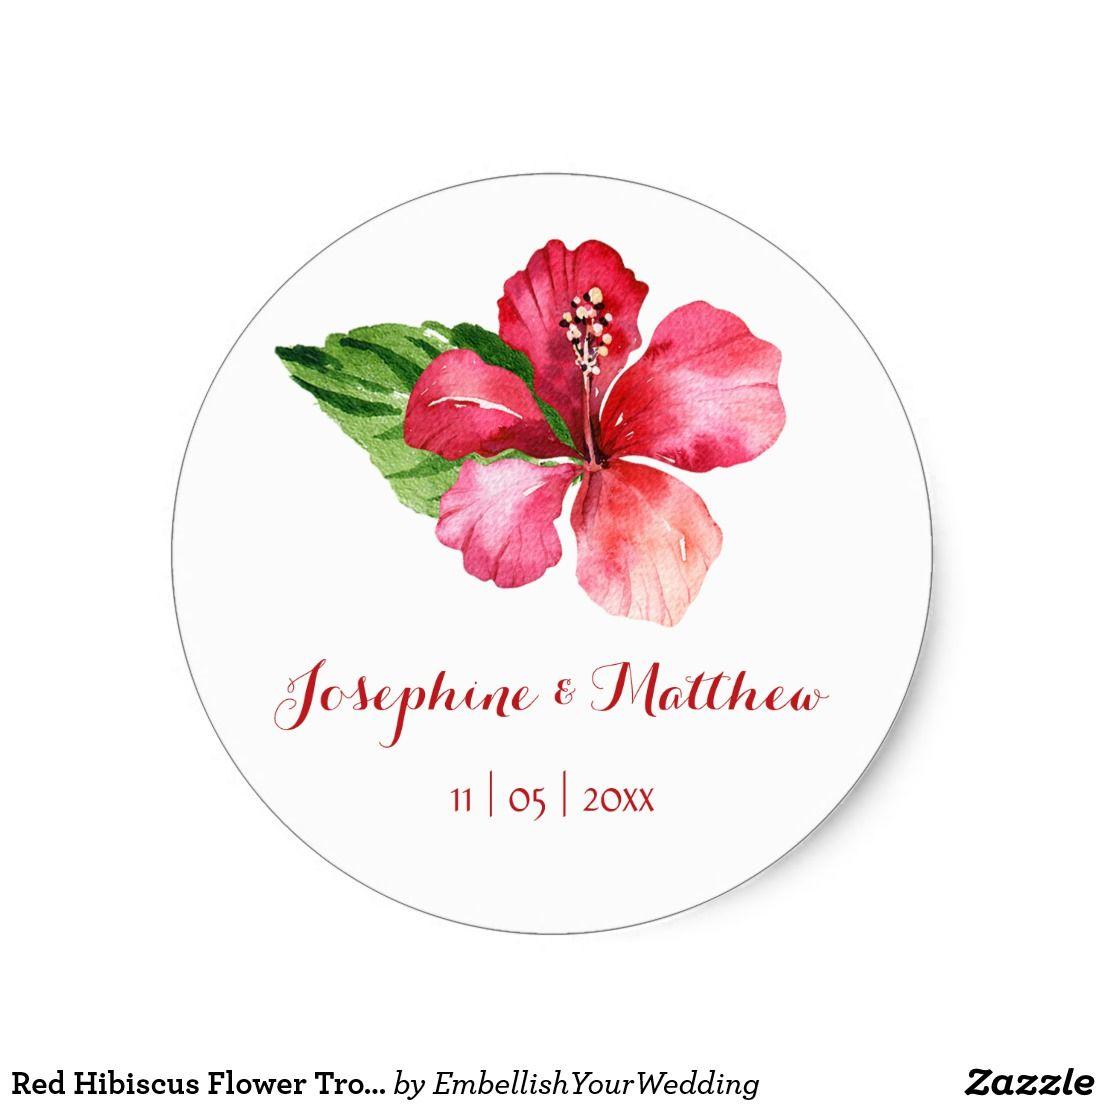 Red hibiscus flower tropical wedding stickers wedding stickers and red hibiscus flower tropical wedding stickers izmirmasajfo